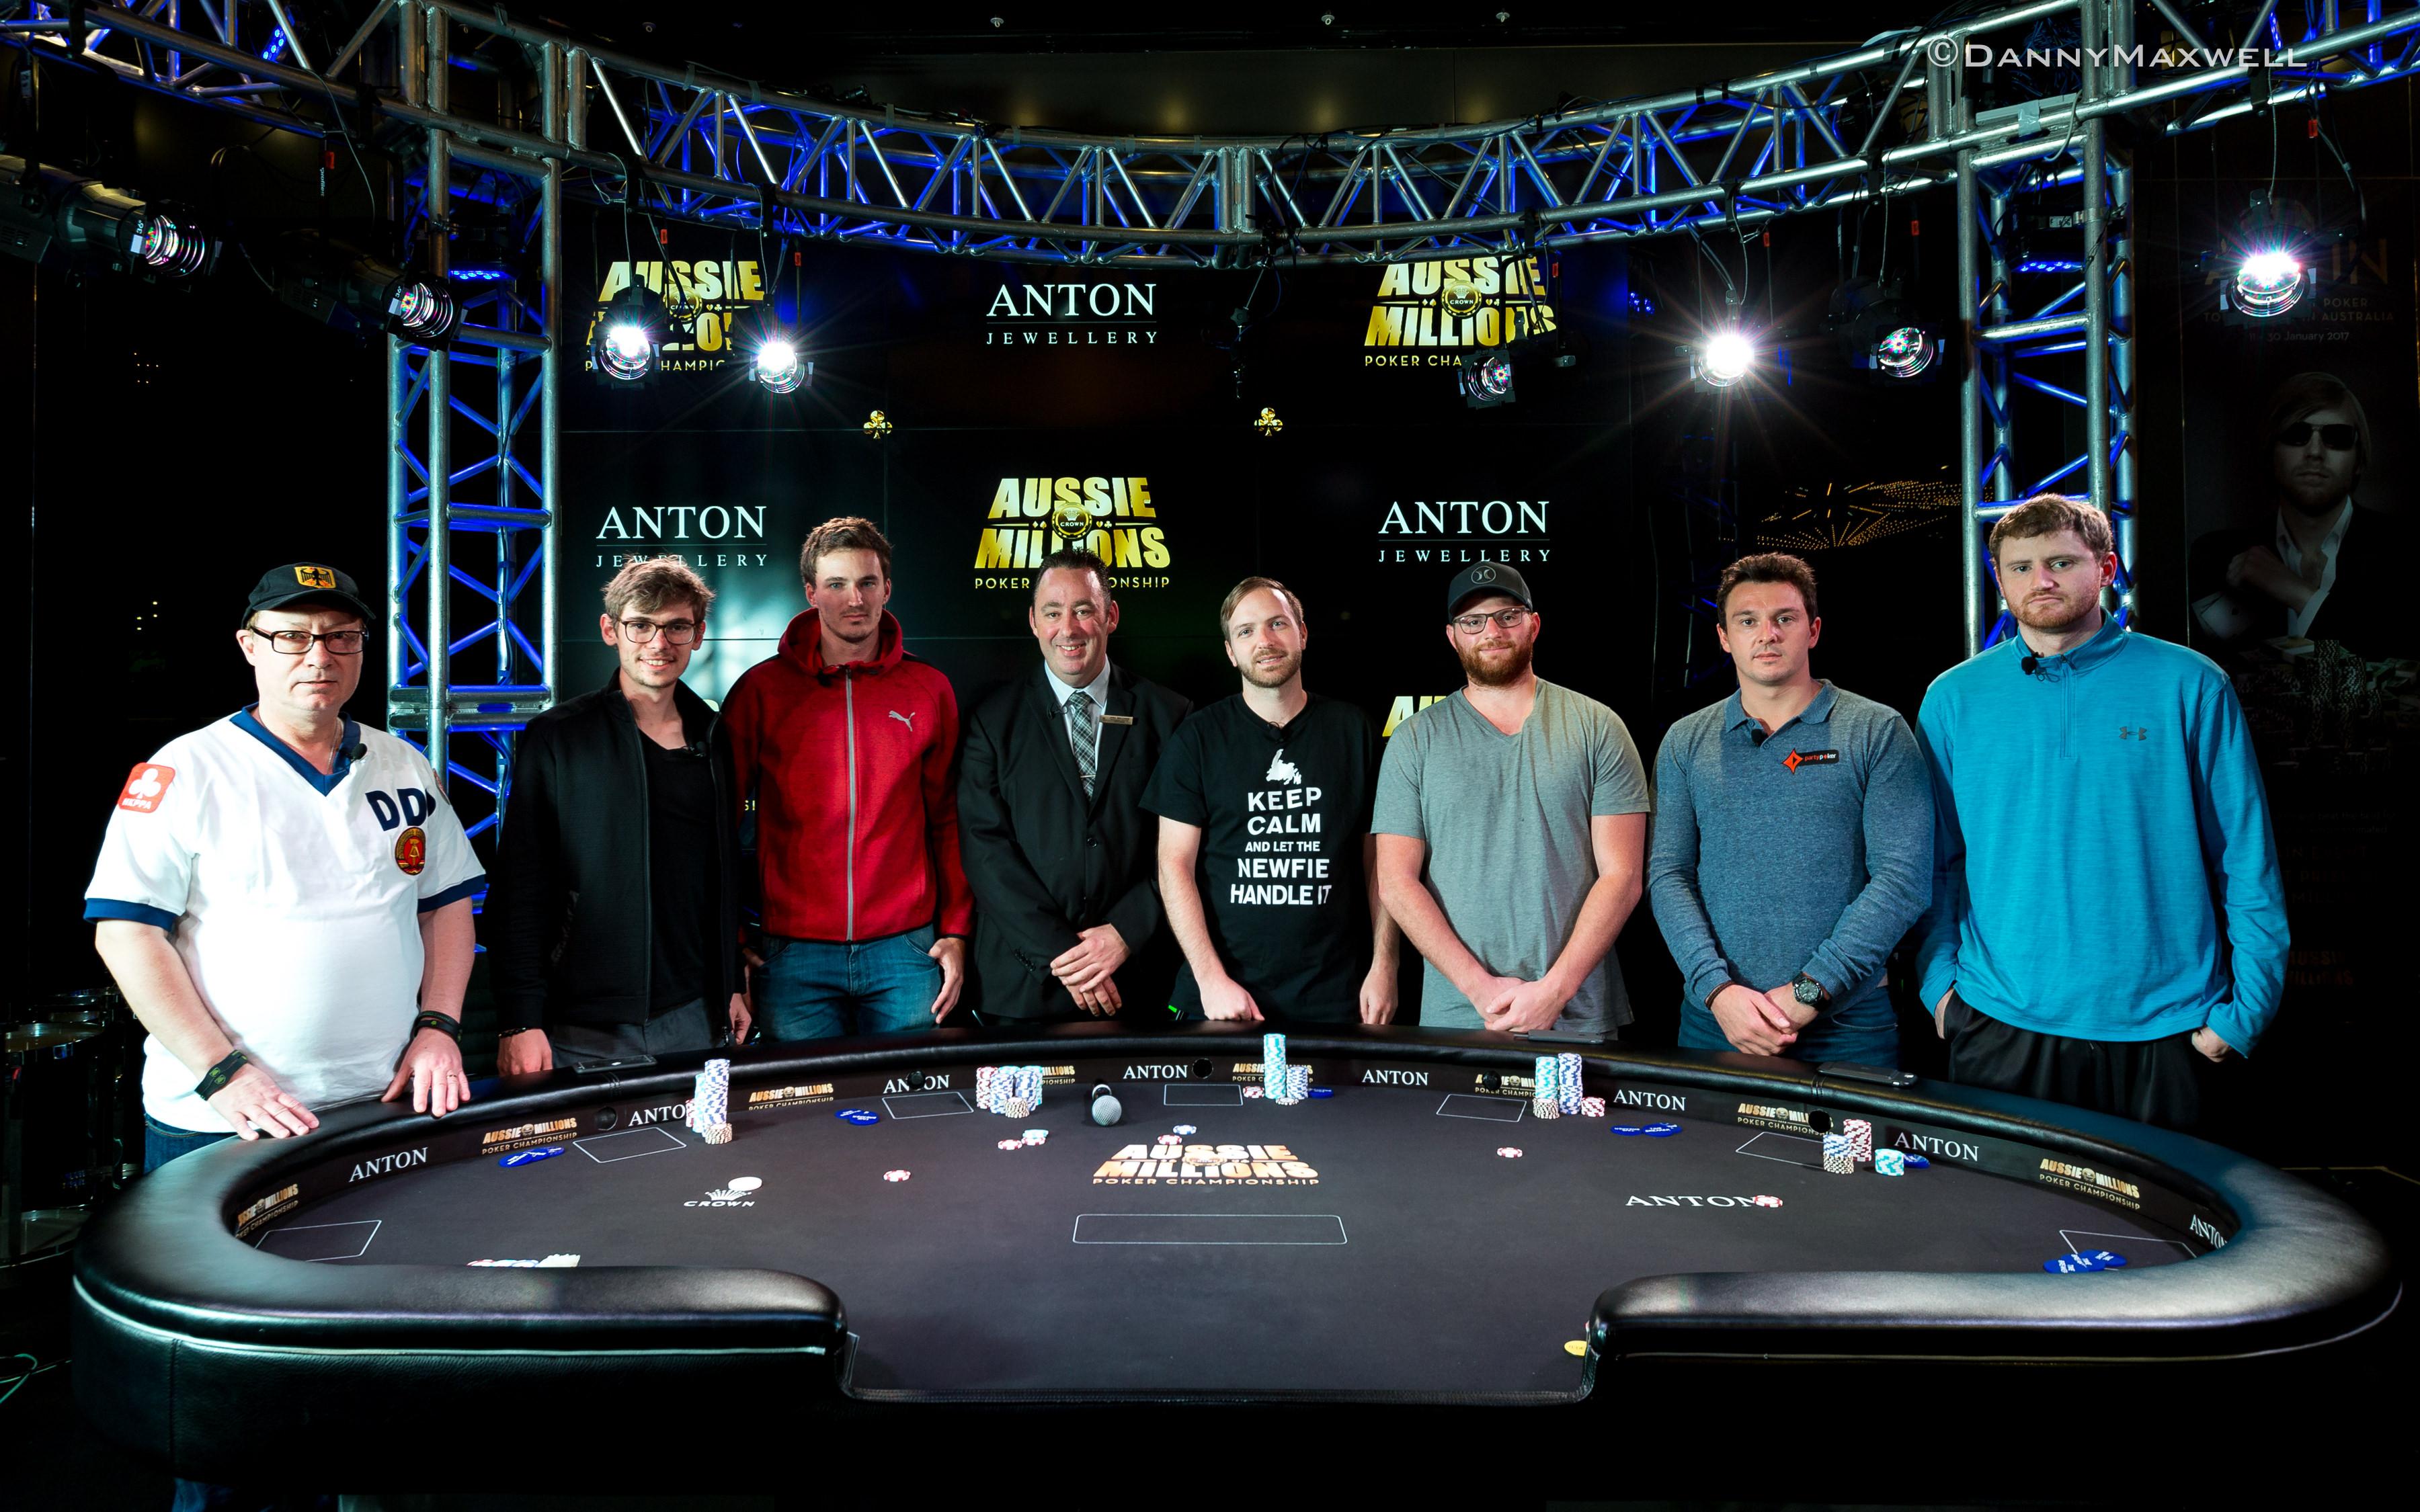 Nick Petrangelo Wins the Aussie Millions ANTON Jewellery 0,000 Challenge for AUD2,000 101